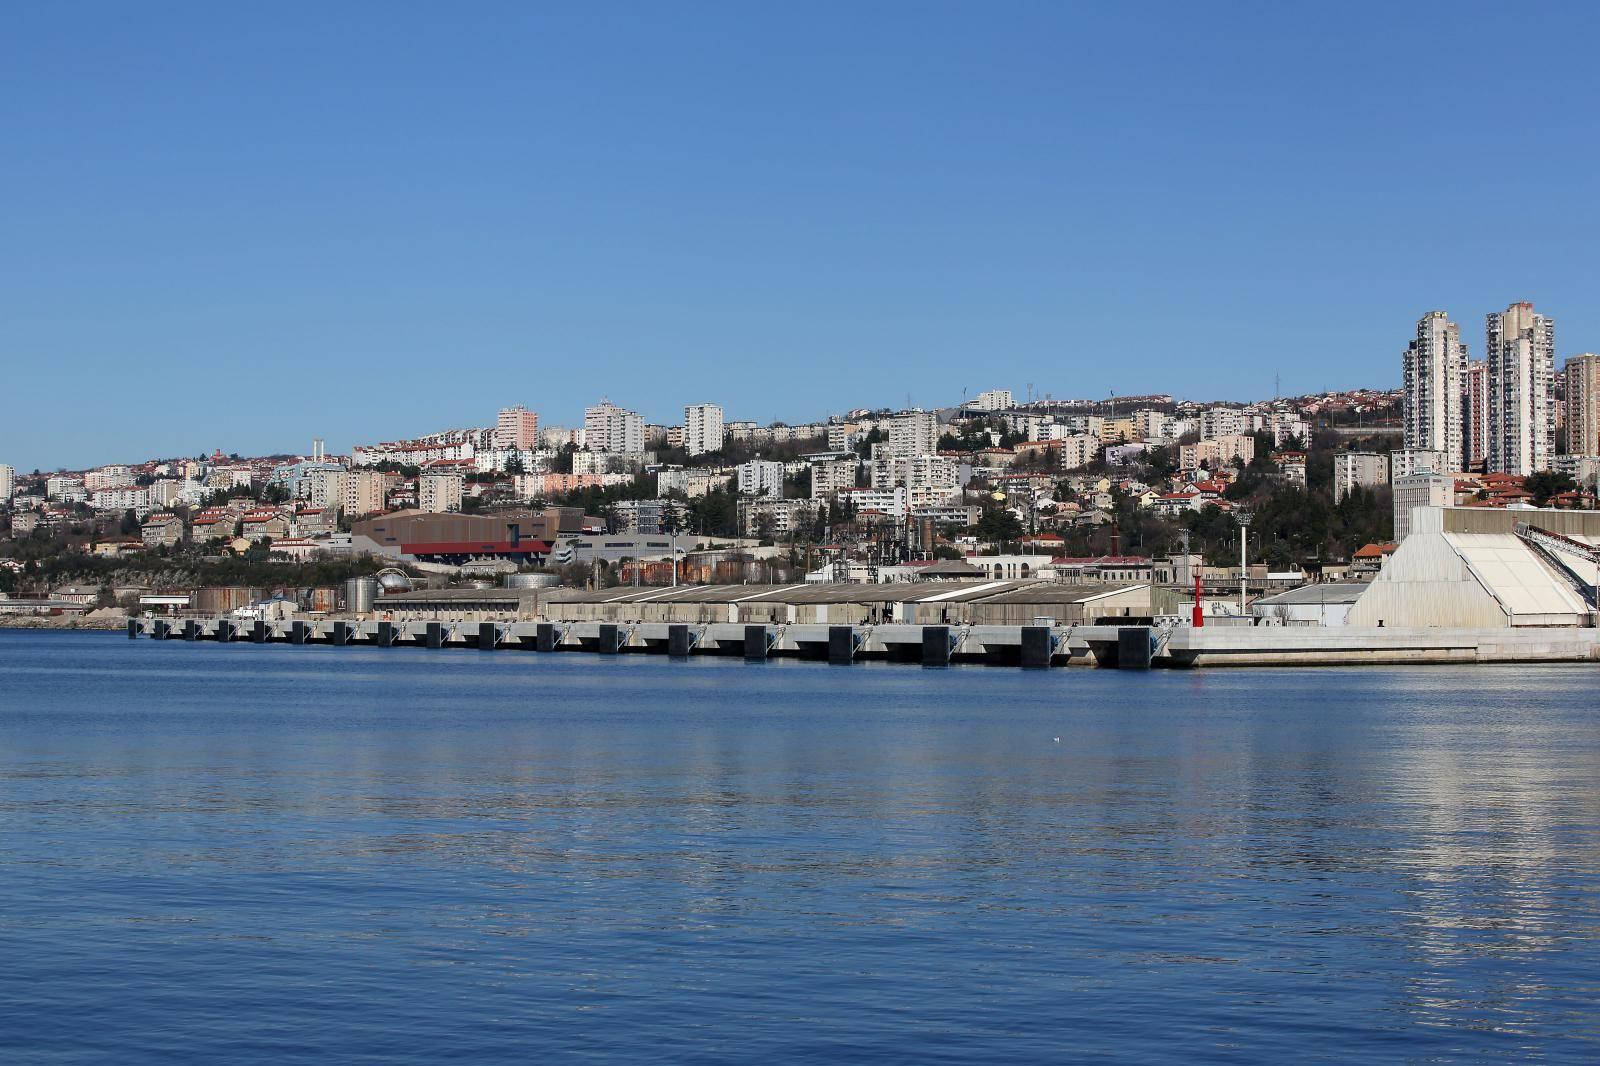 Zagrebacka obala, novi  moderni kontejnerski terminal u Rijeci